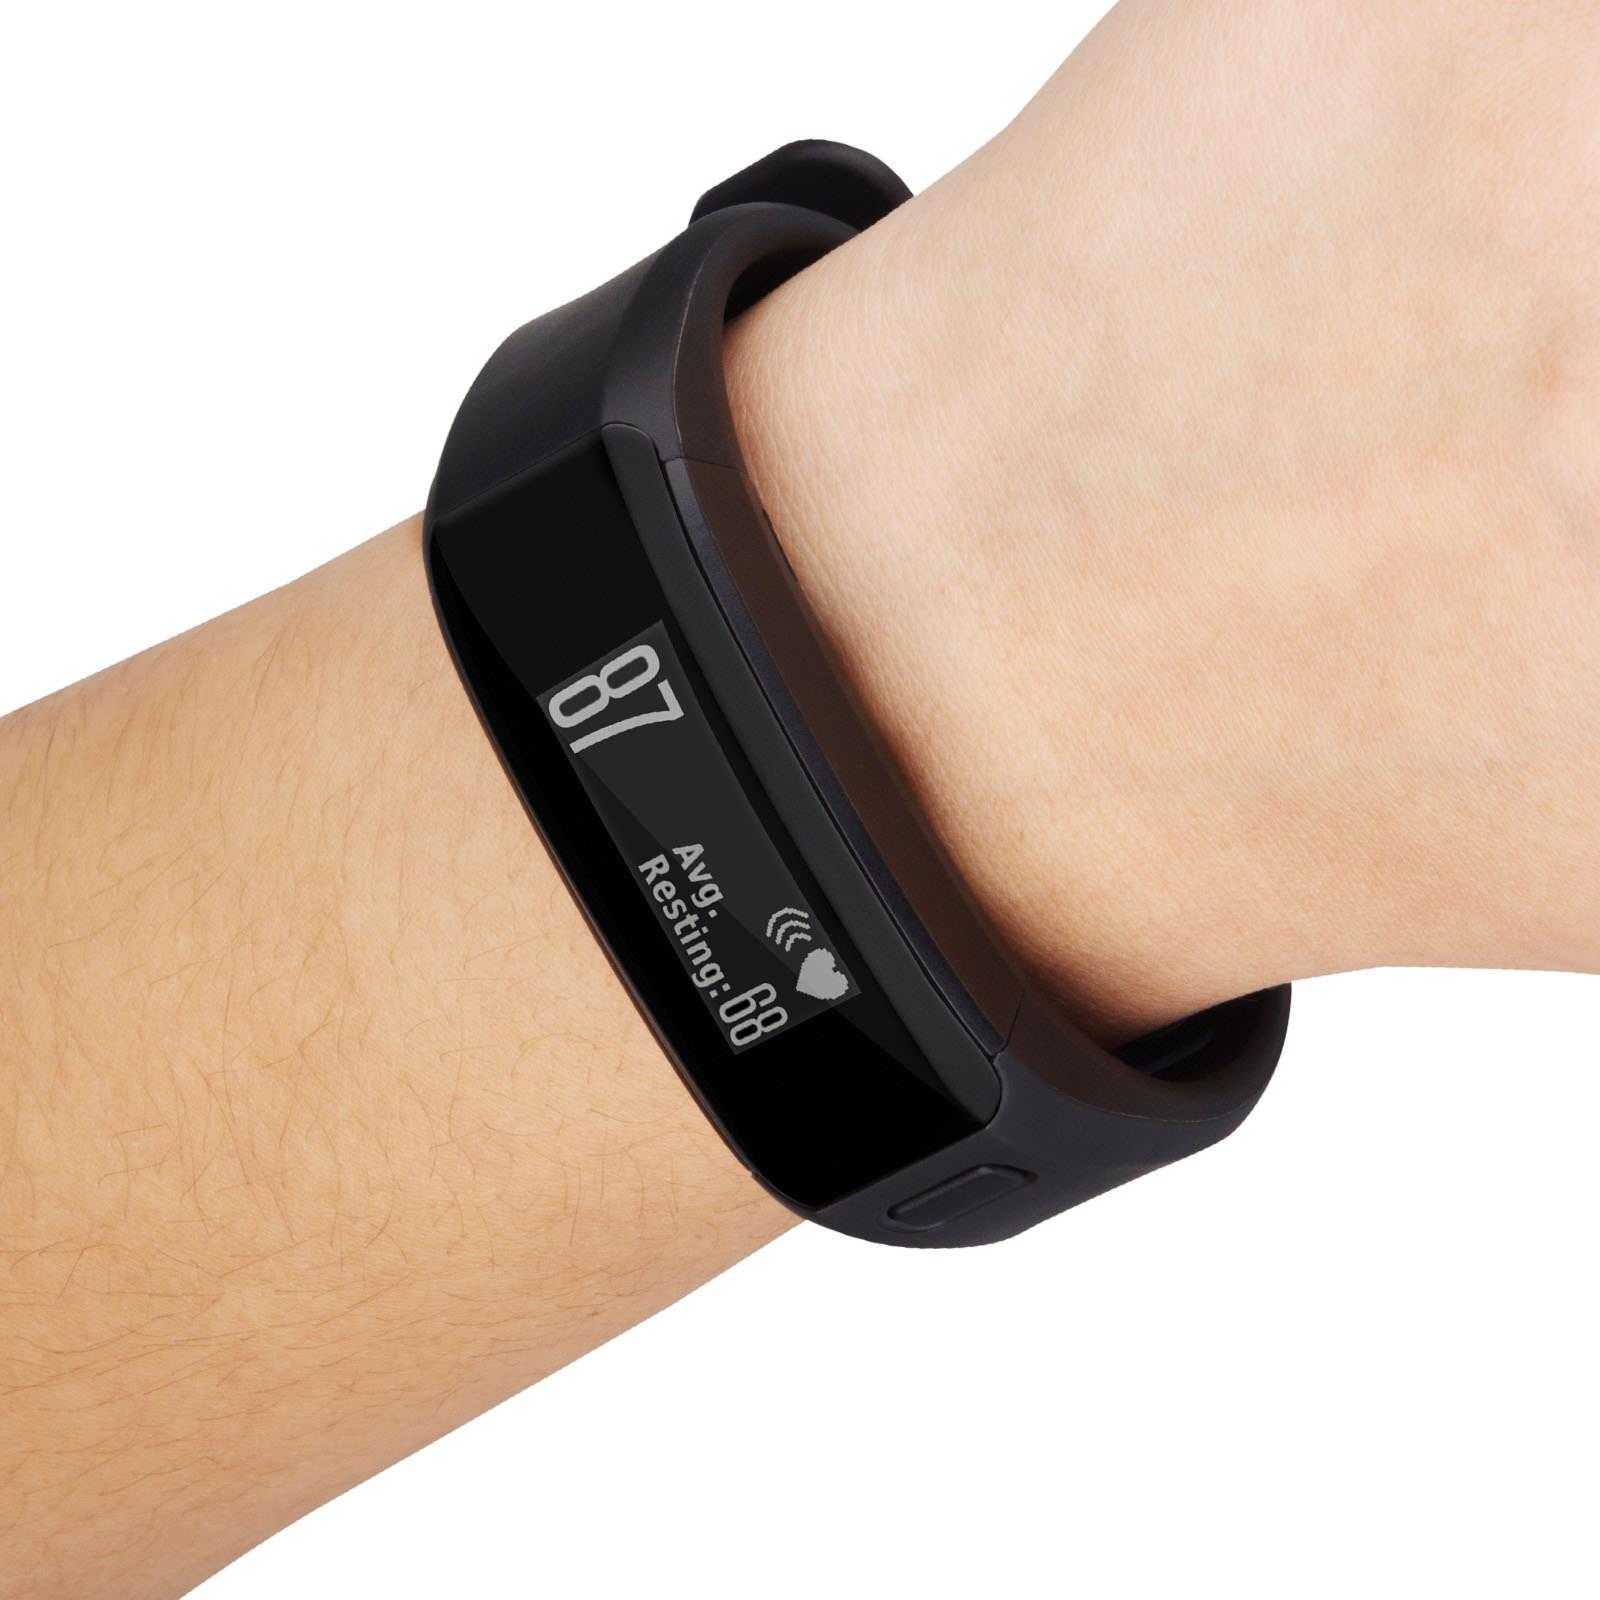 Garmin Vivosmart Hr Bluetooth Fitness Band For Ios And